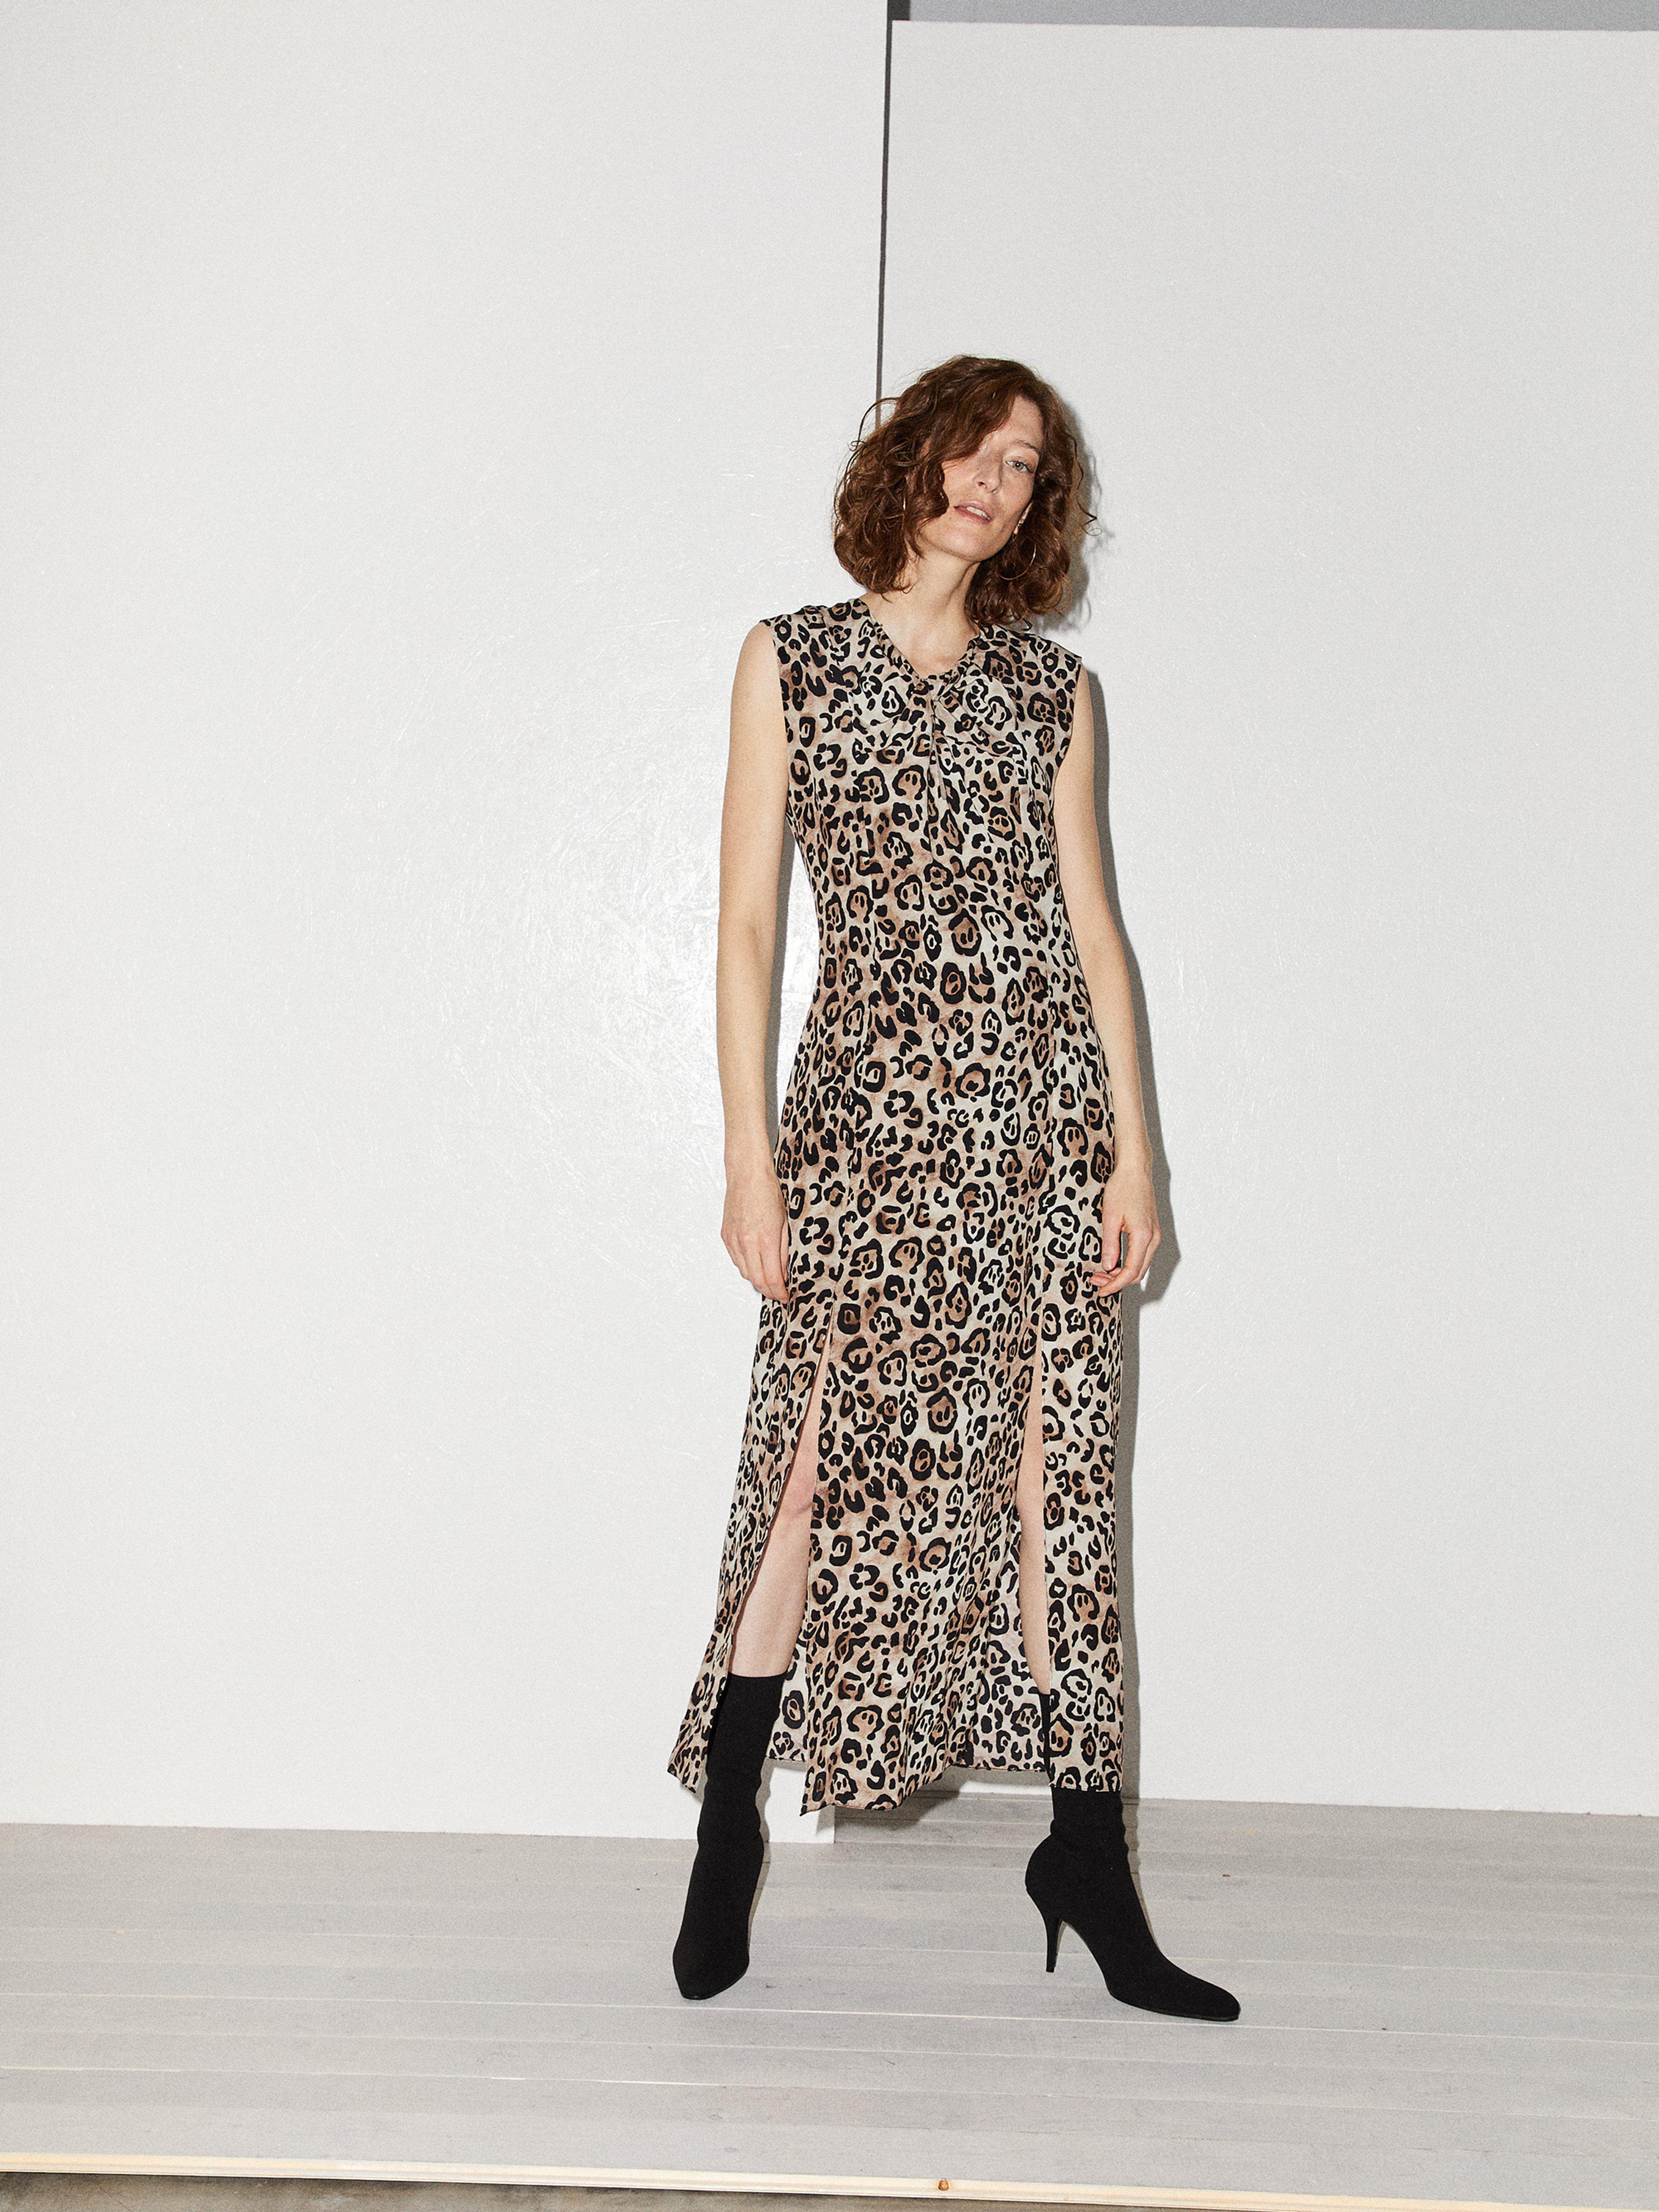 b6cac9f559 Raey - Multicolor Knot Front Leopard Print Silk Dress - Lyst. View  fullscreen